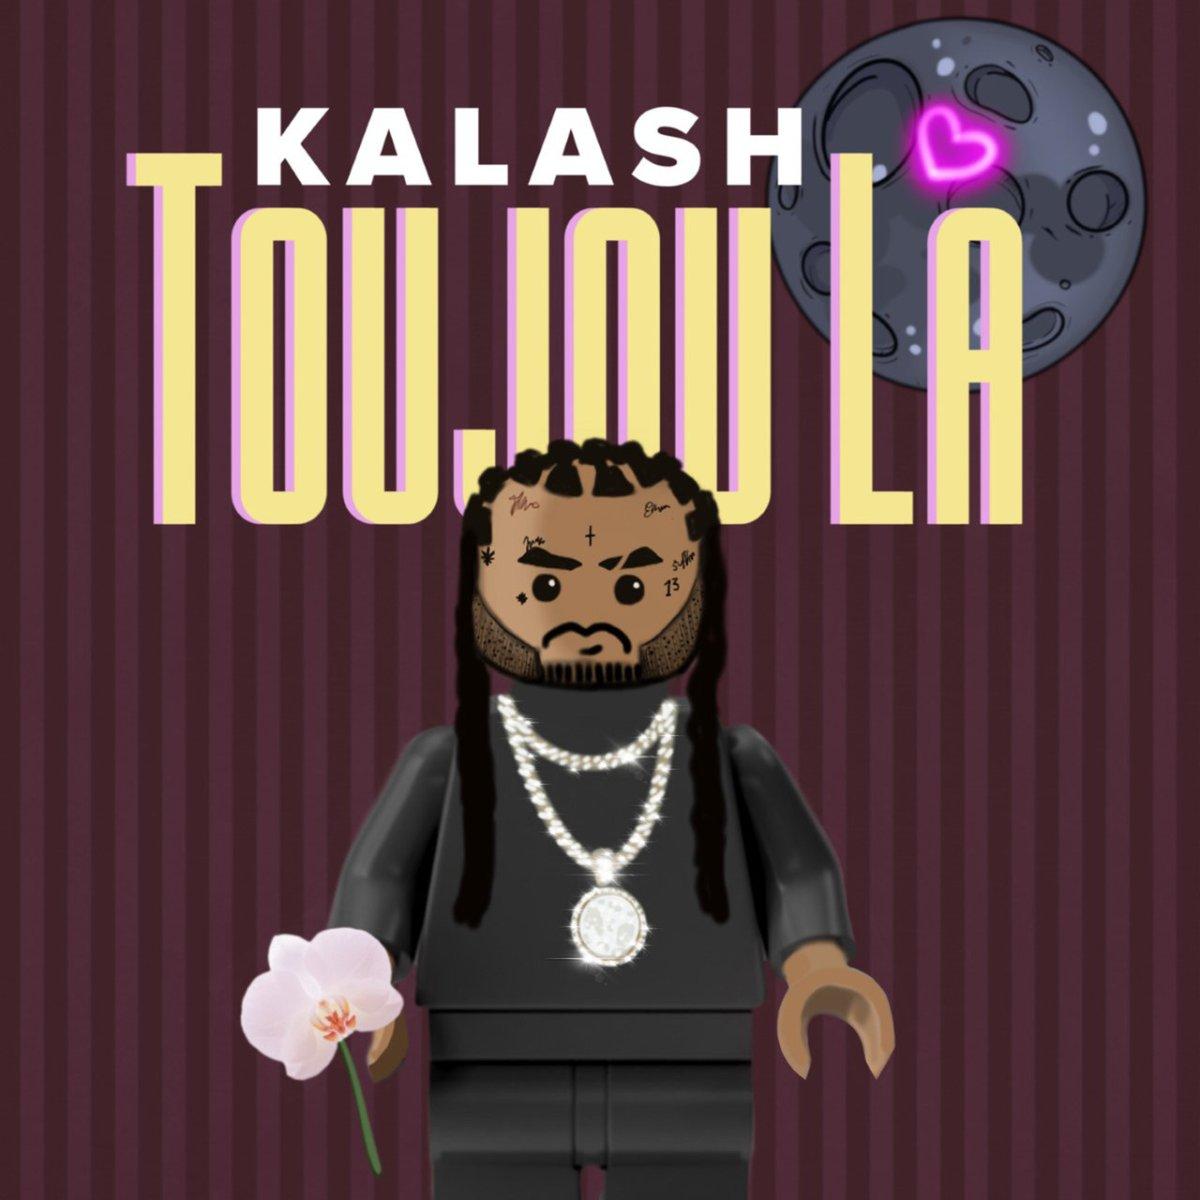 Kalash - Toujou La (Cover)